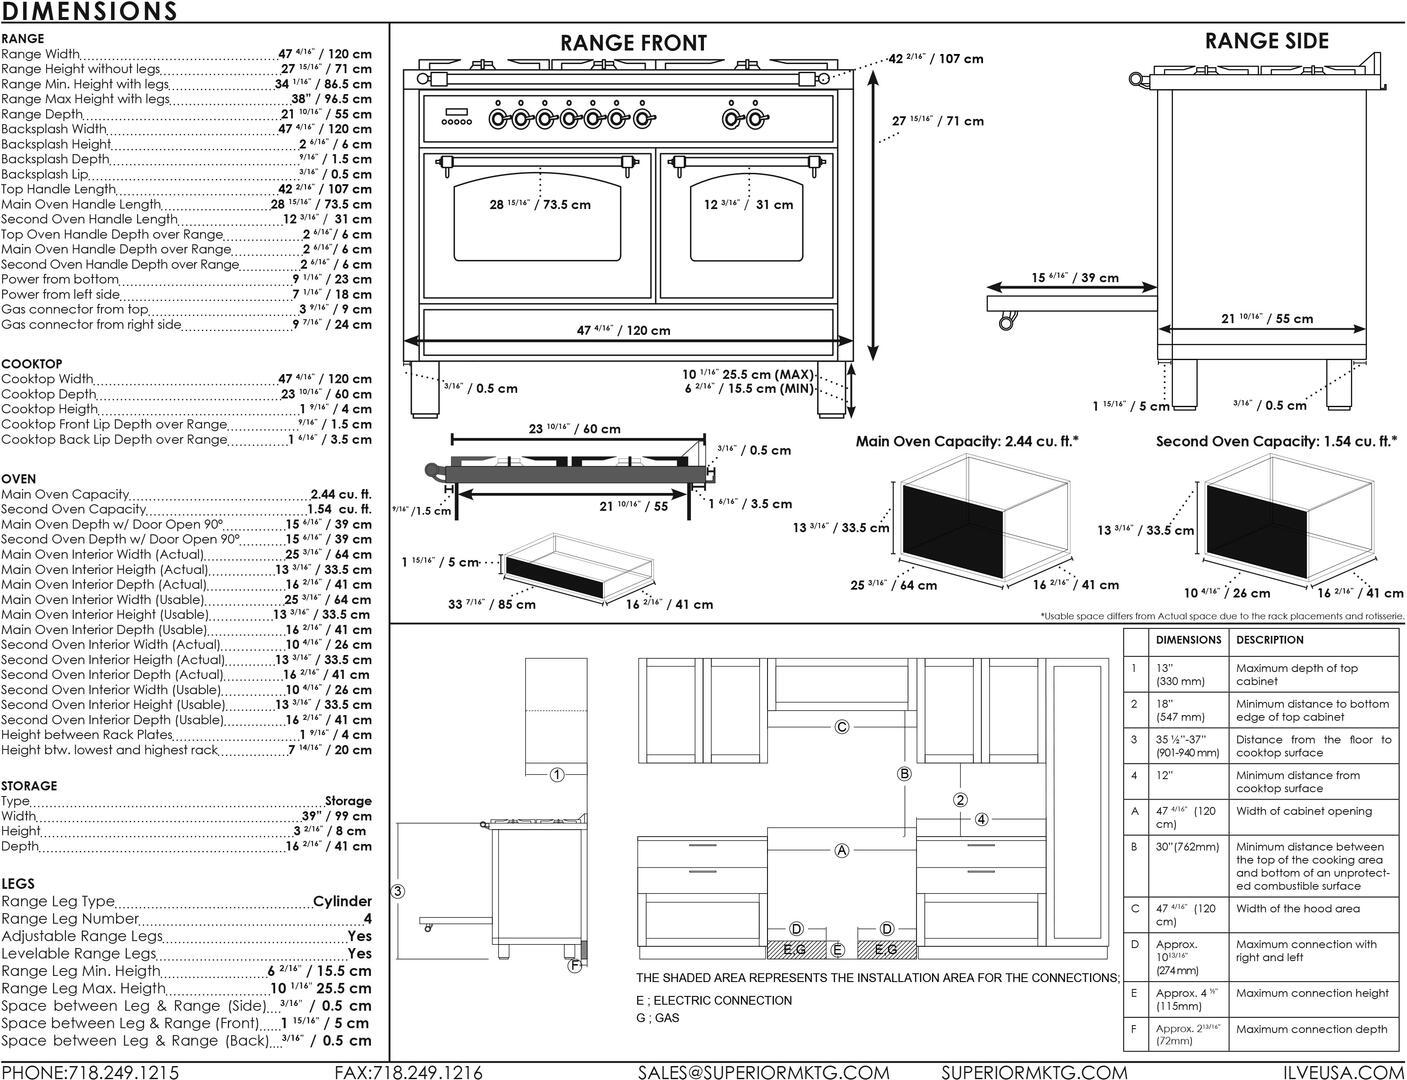 Ilve Professional Plus UPW120FDMPM Freestanding Dual Fuel Range Gray, UPDW120FDM Dimensions Guide